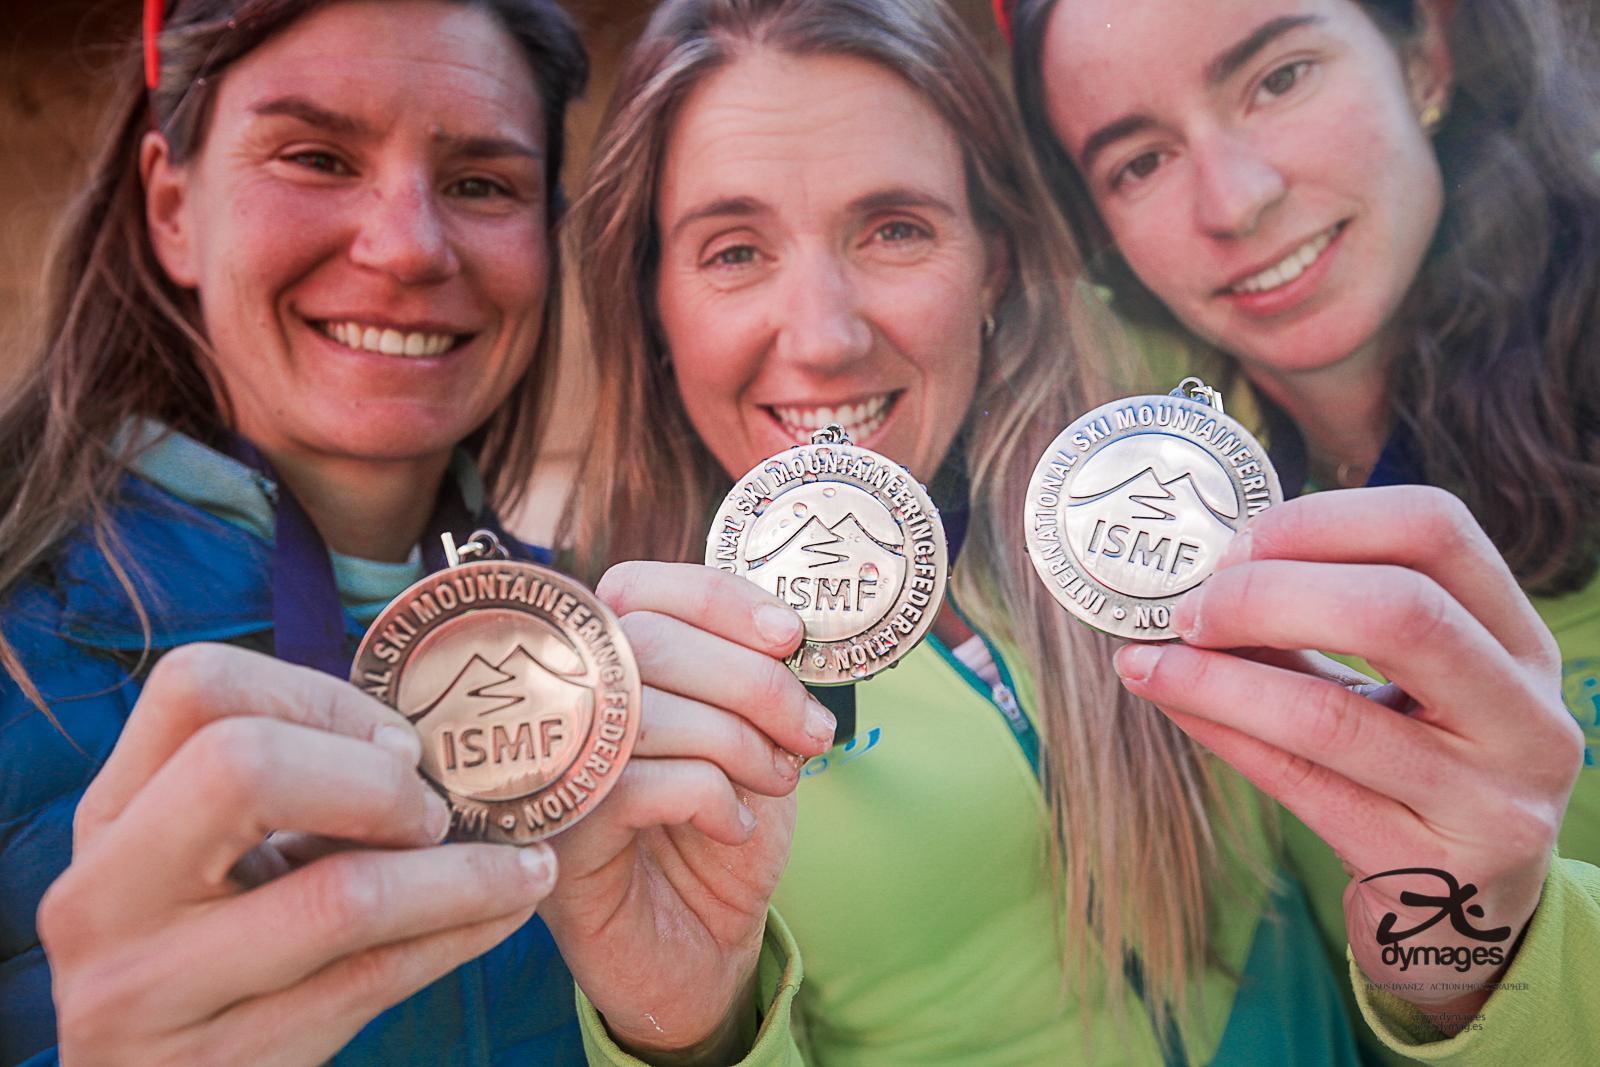 Esquí de Montaña: MUNDIAL SKIMO 2019 SUIZA. Oro RELEVOS para Italia (M) y Francia (F) España logra plata femenina y bronce masculino.